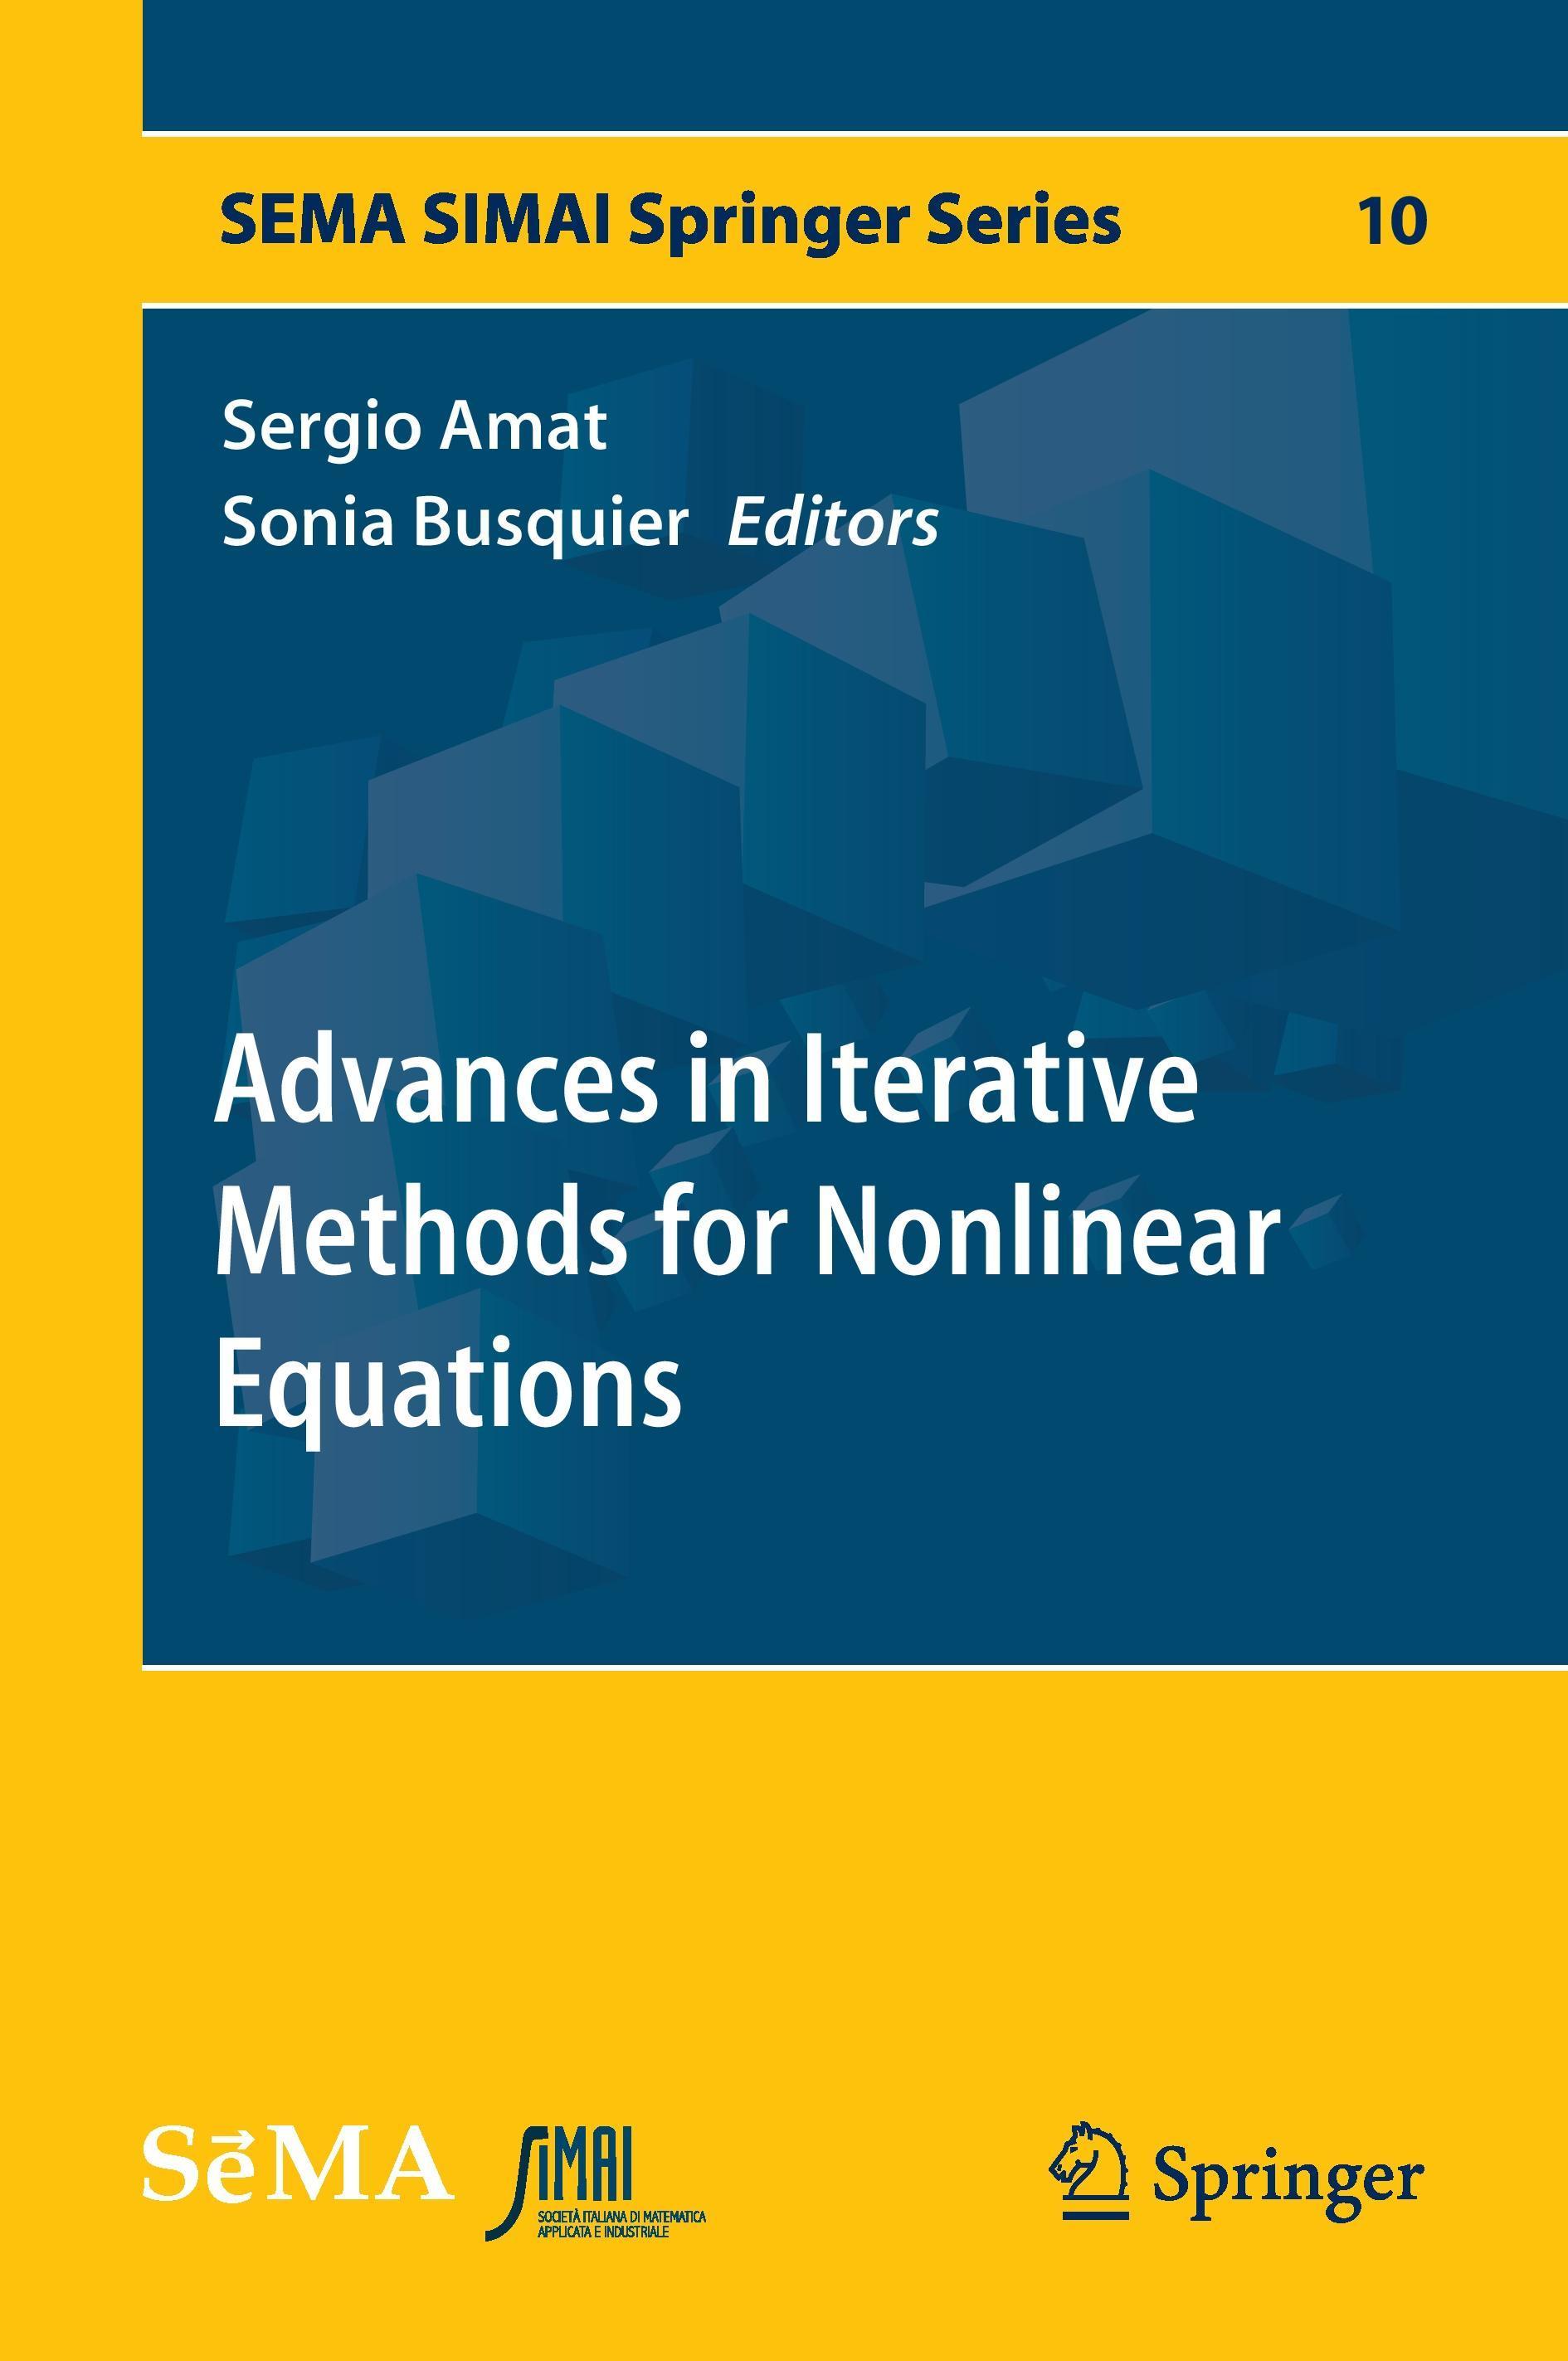 Advances in Iterative Methods for Nonlinear Equations  SEMA SIMAI Springer Ser..